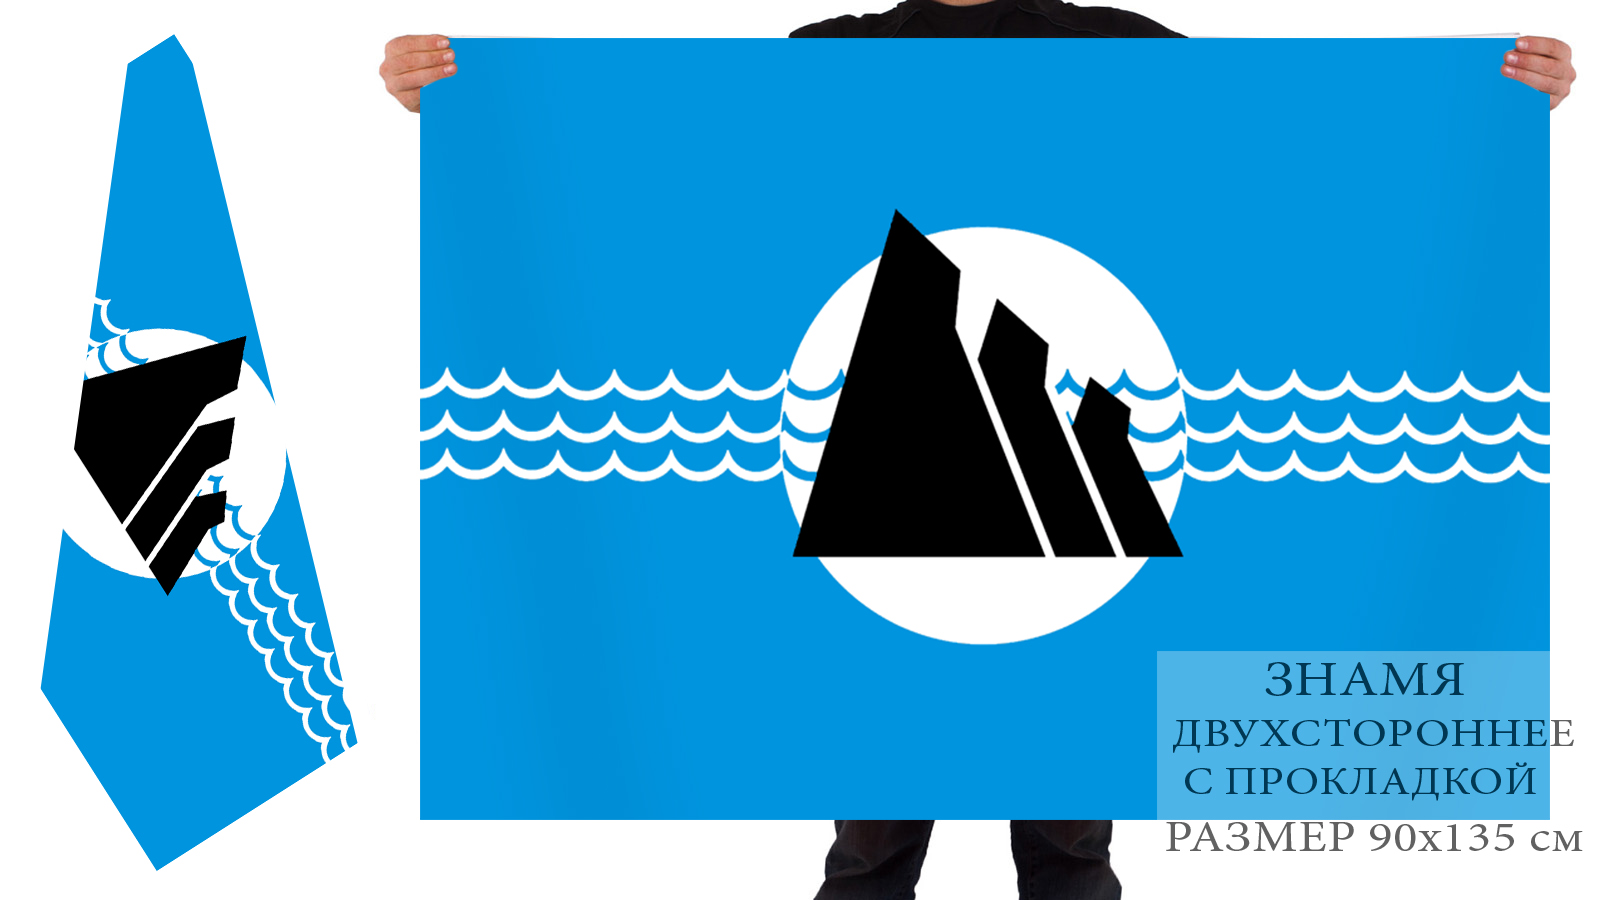 Двусторонний флаг городского округа Александровск-Сахалинский район